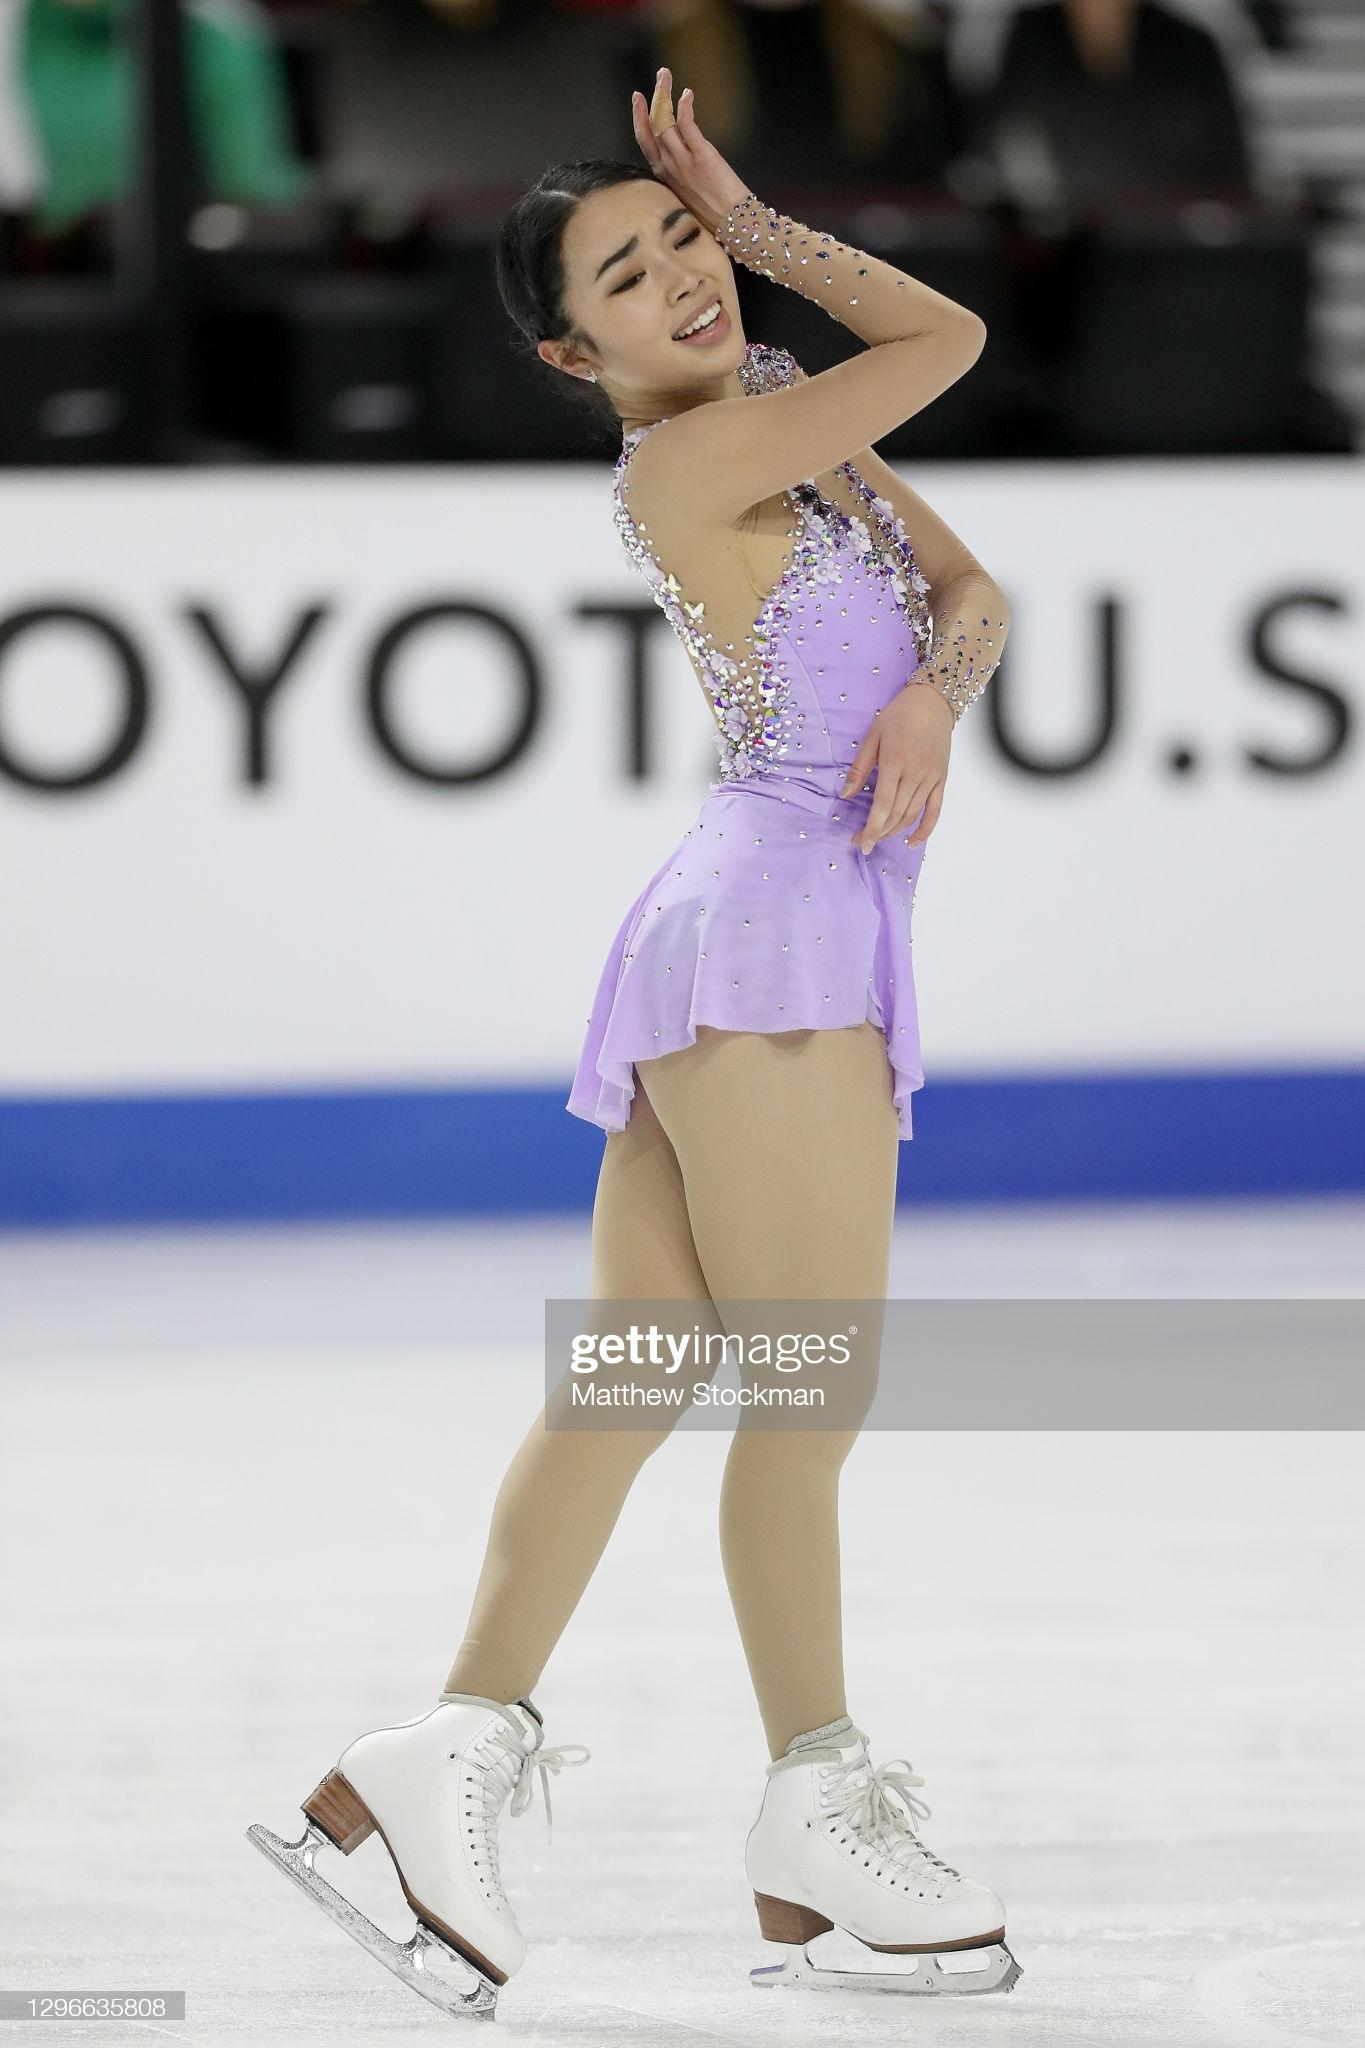 https://i.ibb.co/swCxtYD/LAS-VEGAS-NEVADA-JANUARY-15-Karen-Chen-skates-in-the-Ladies-Free-Skate-during-the-U-S-Figure-Skating.jpg